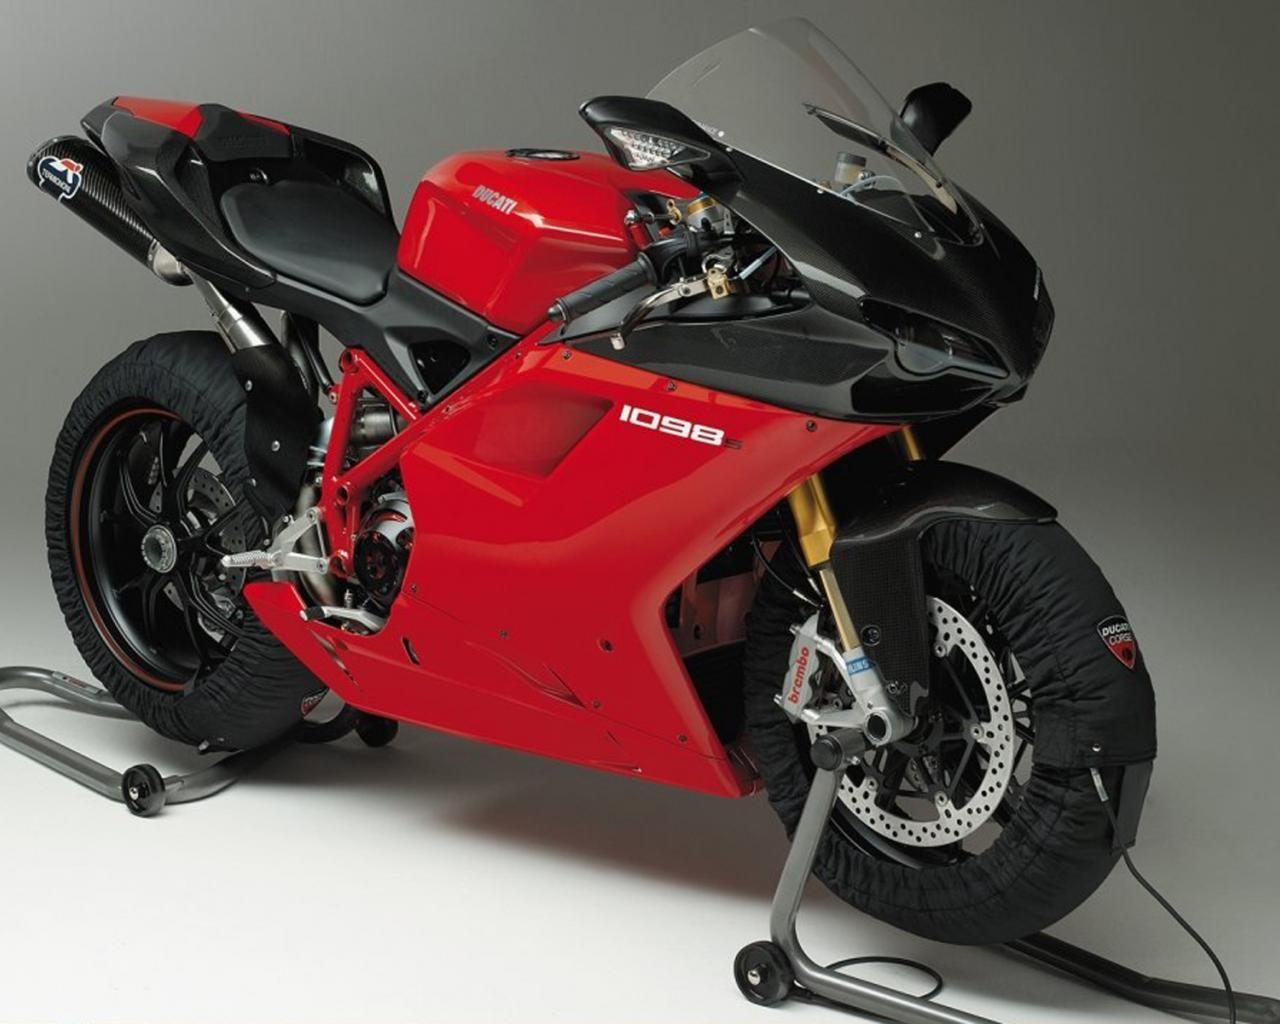 Ducati 1098 S Normal 1280x1024 Ducati Red Bike Bike